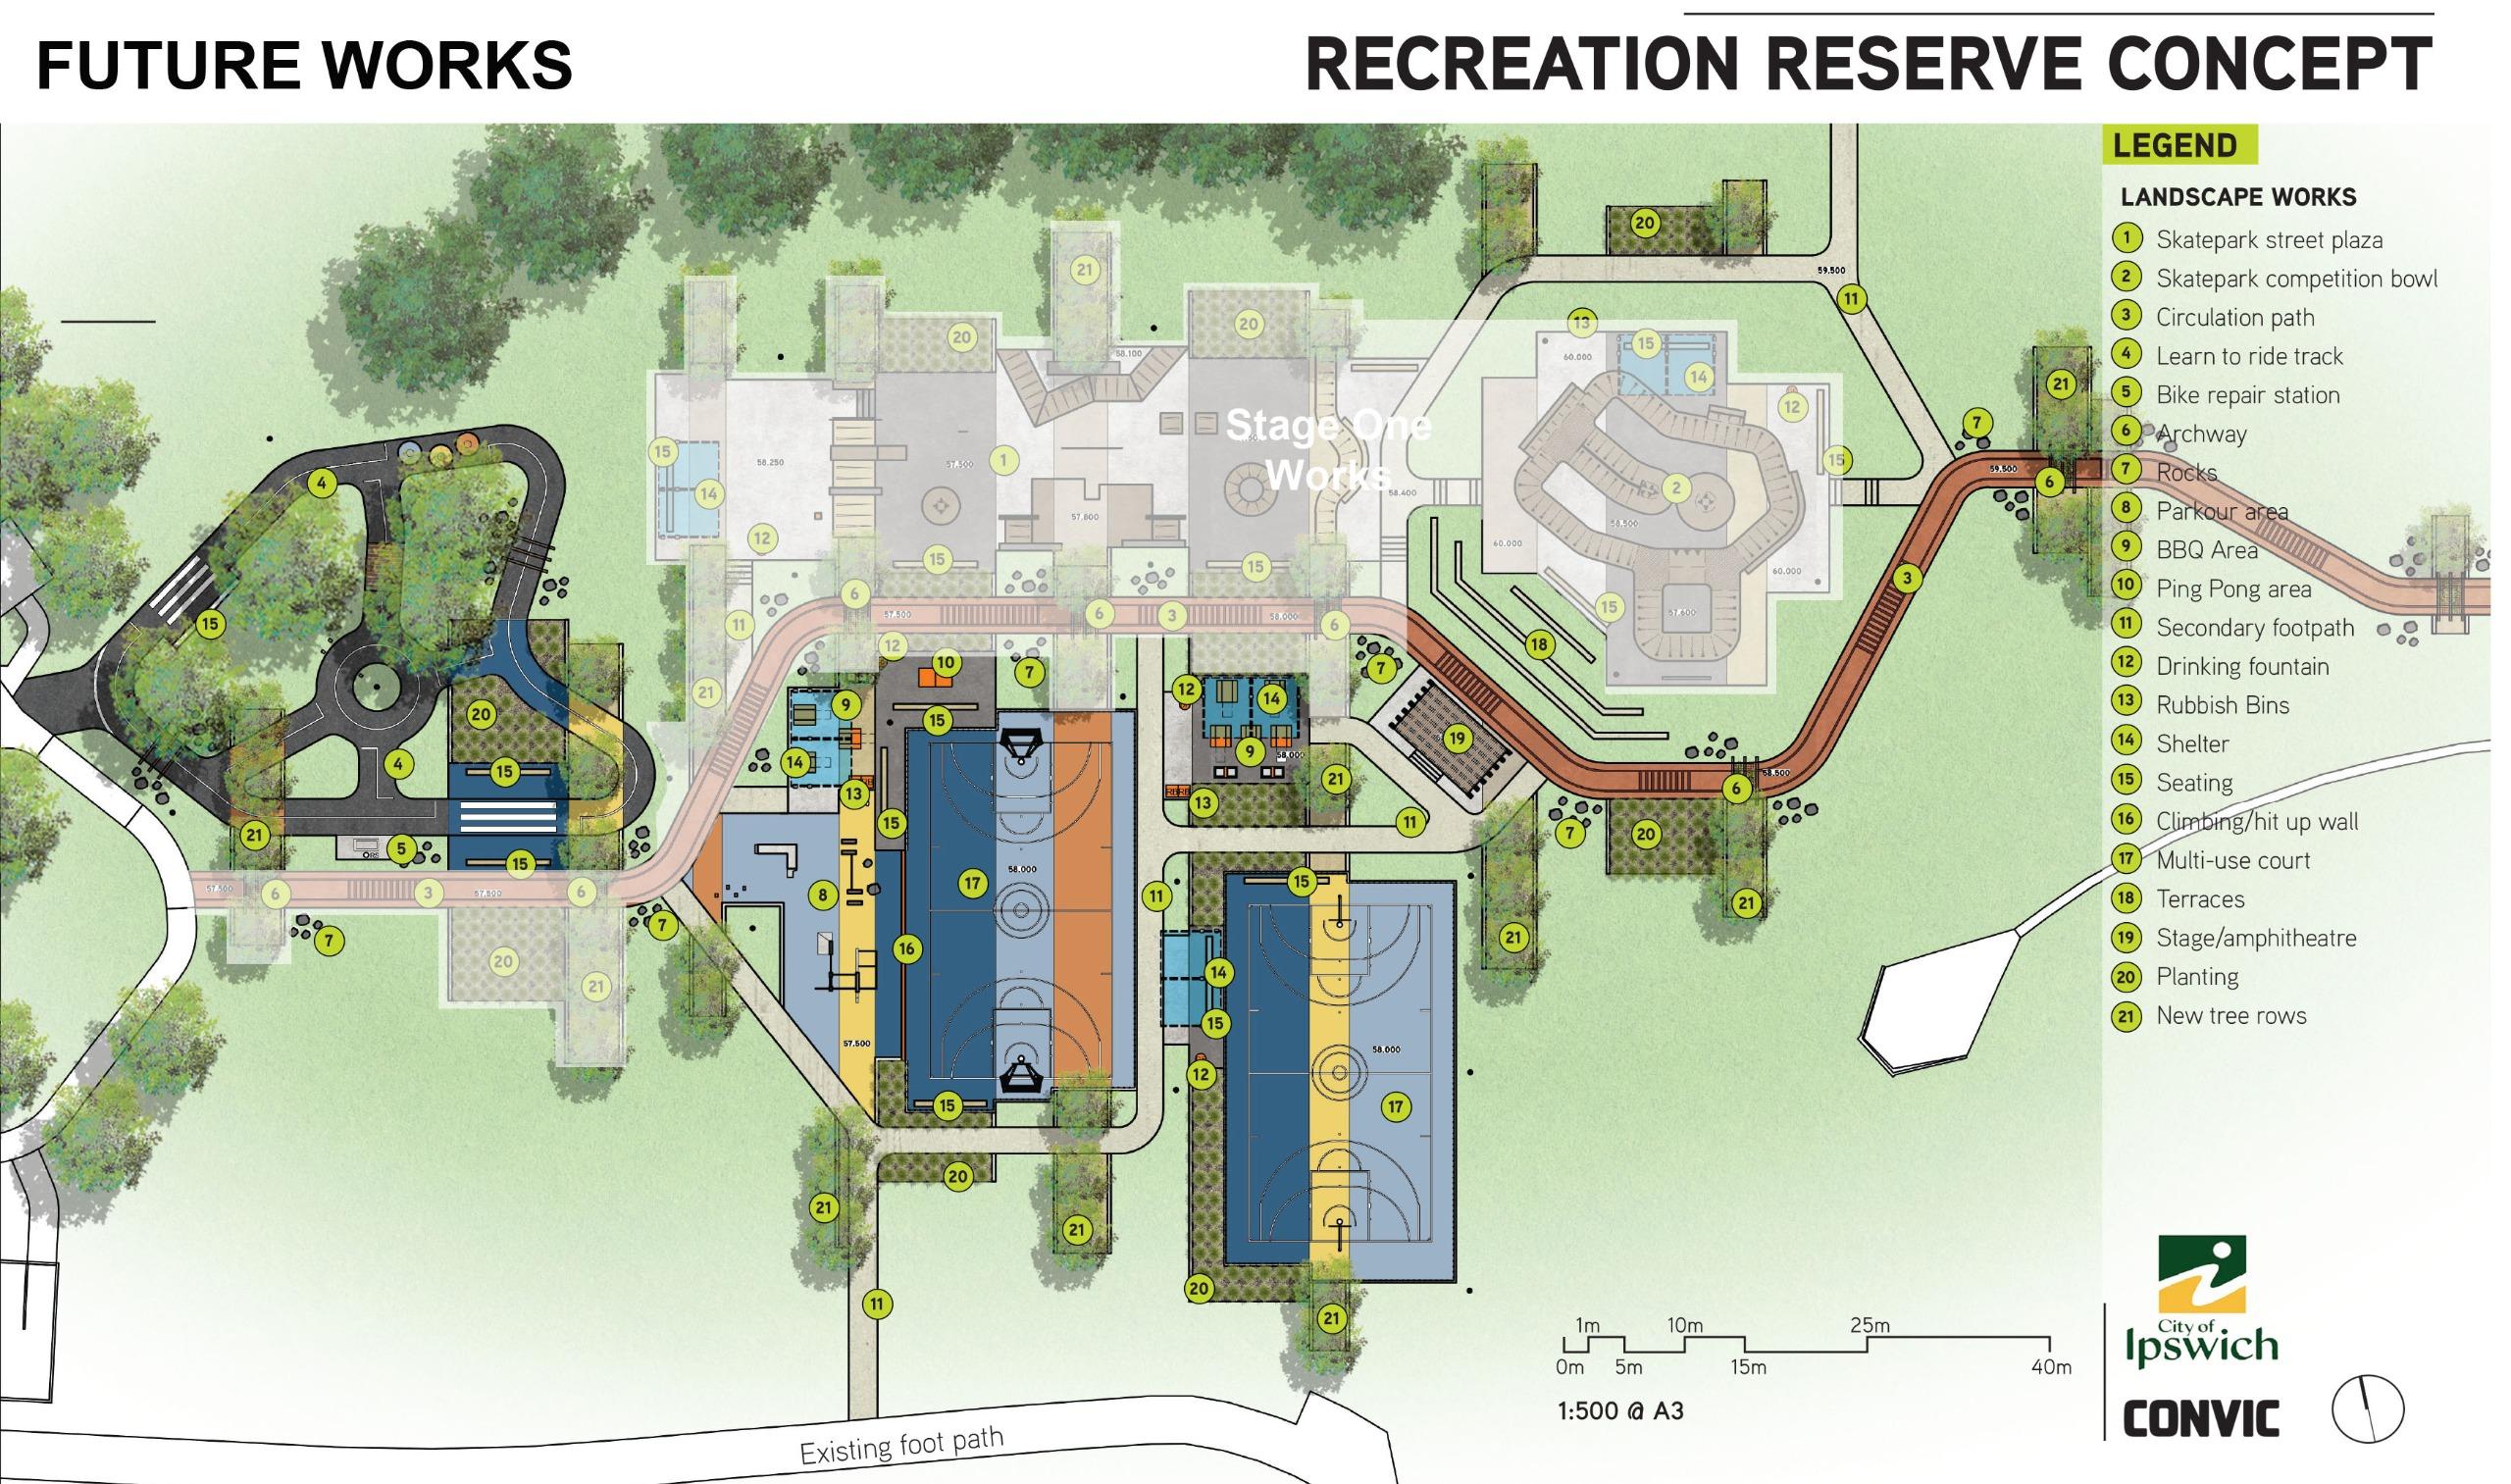 Proposed design concept of future works